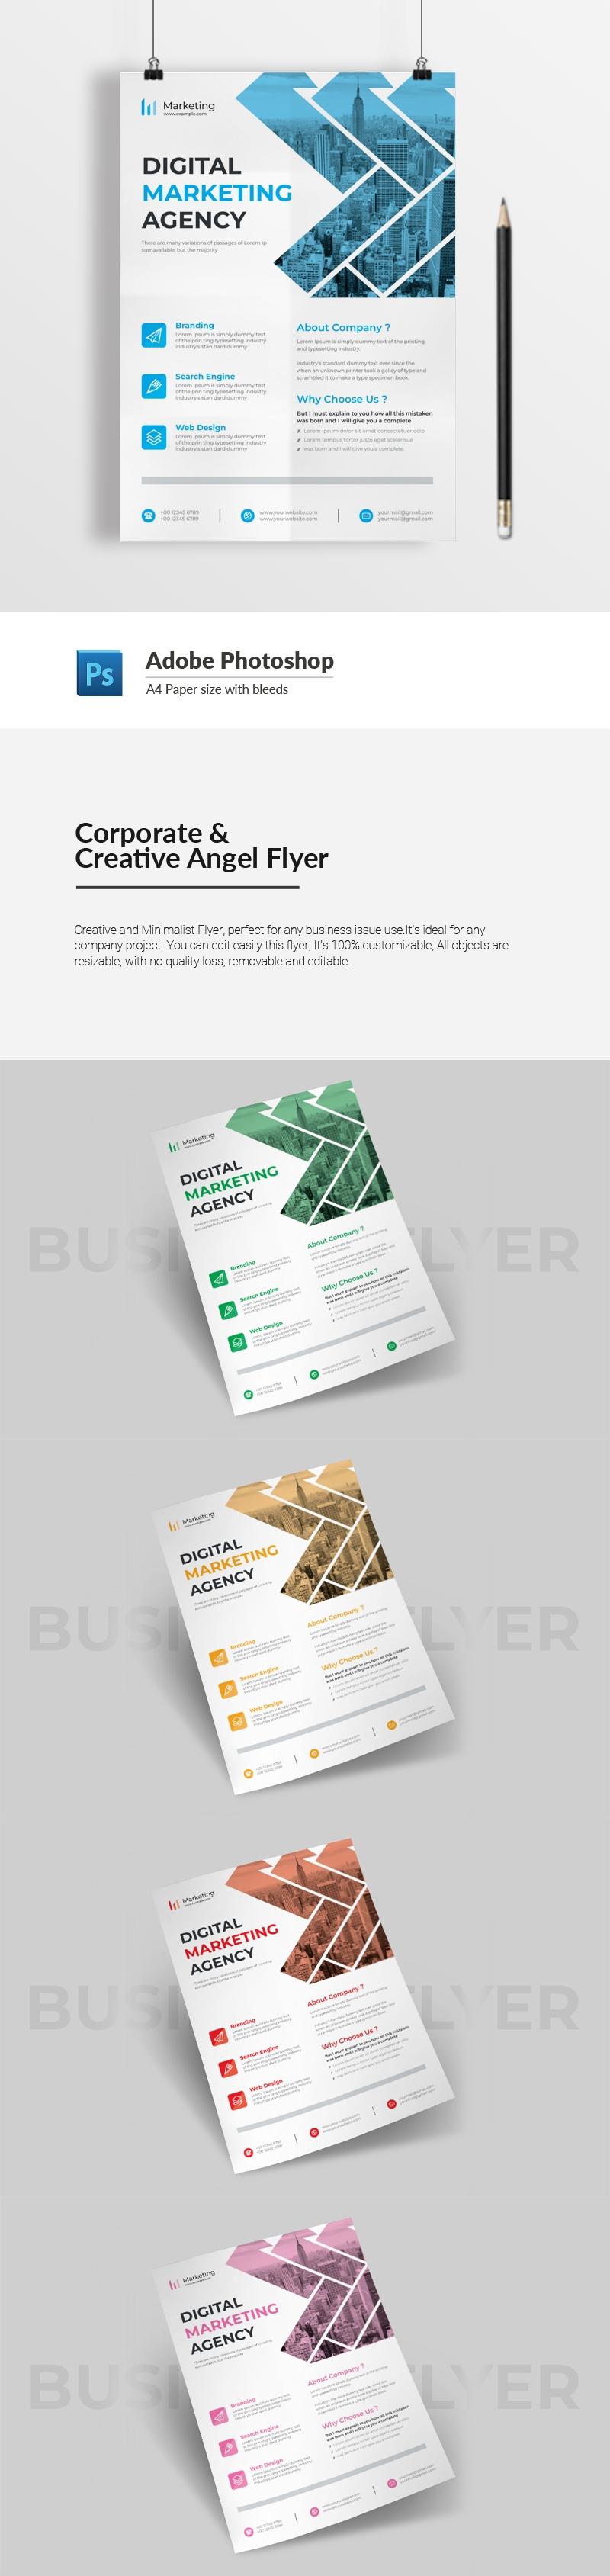 Corporate & Creative Angel Flyer